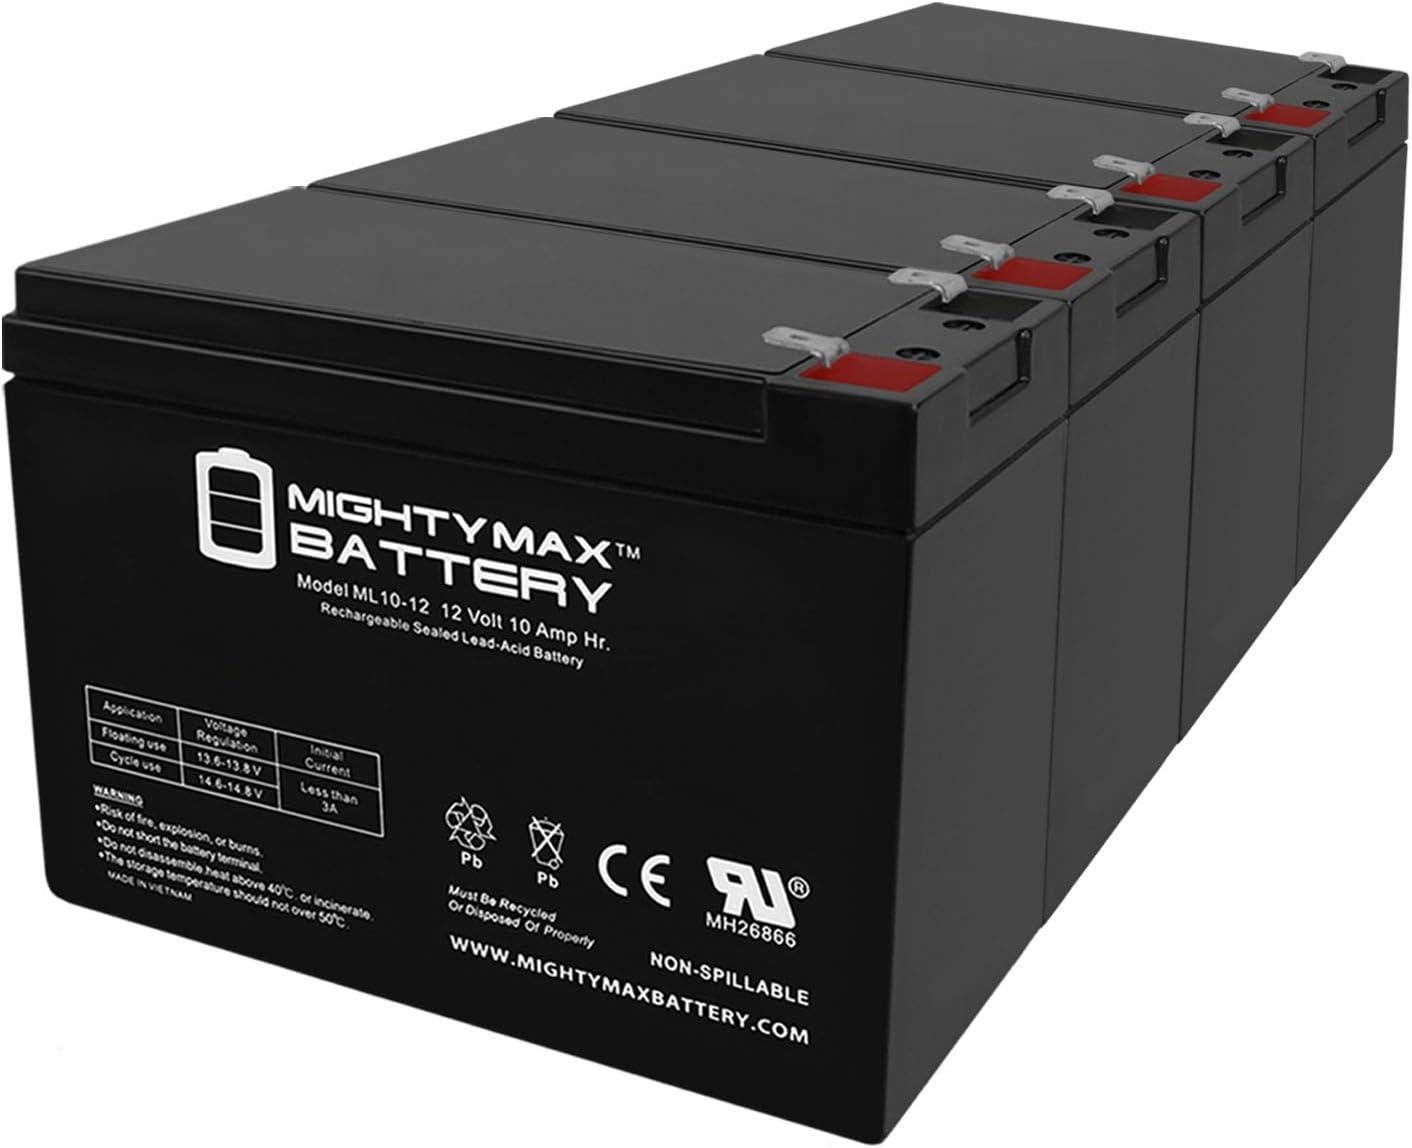 Mighty Max Battery ML10-12 - Albuquerque Mall 12V Outstanding Liebert S SB-6KV UpStation 10AH